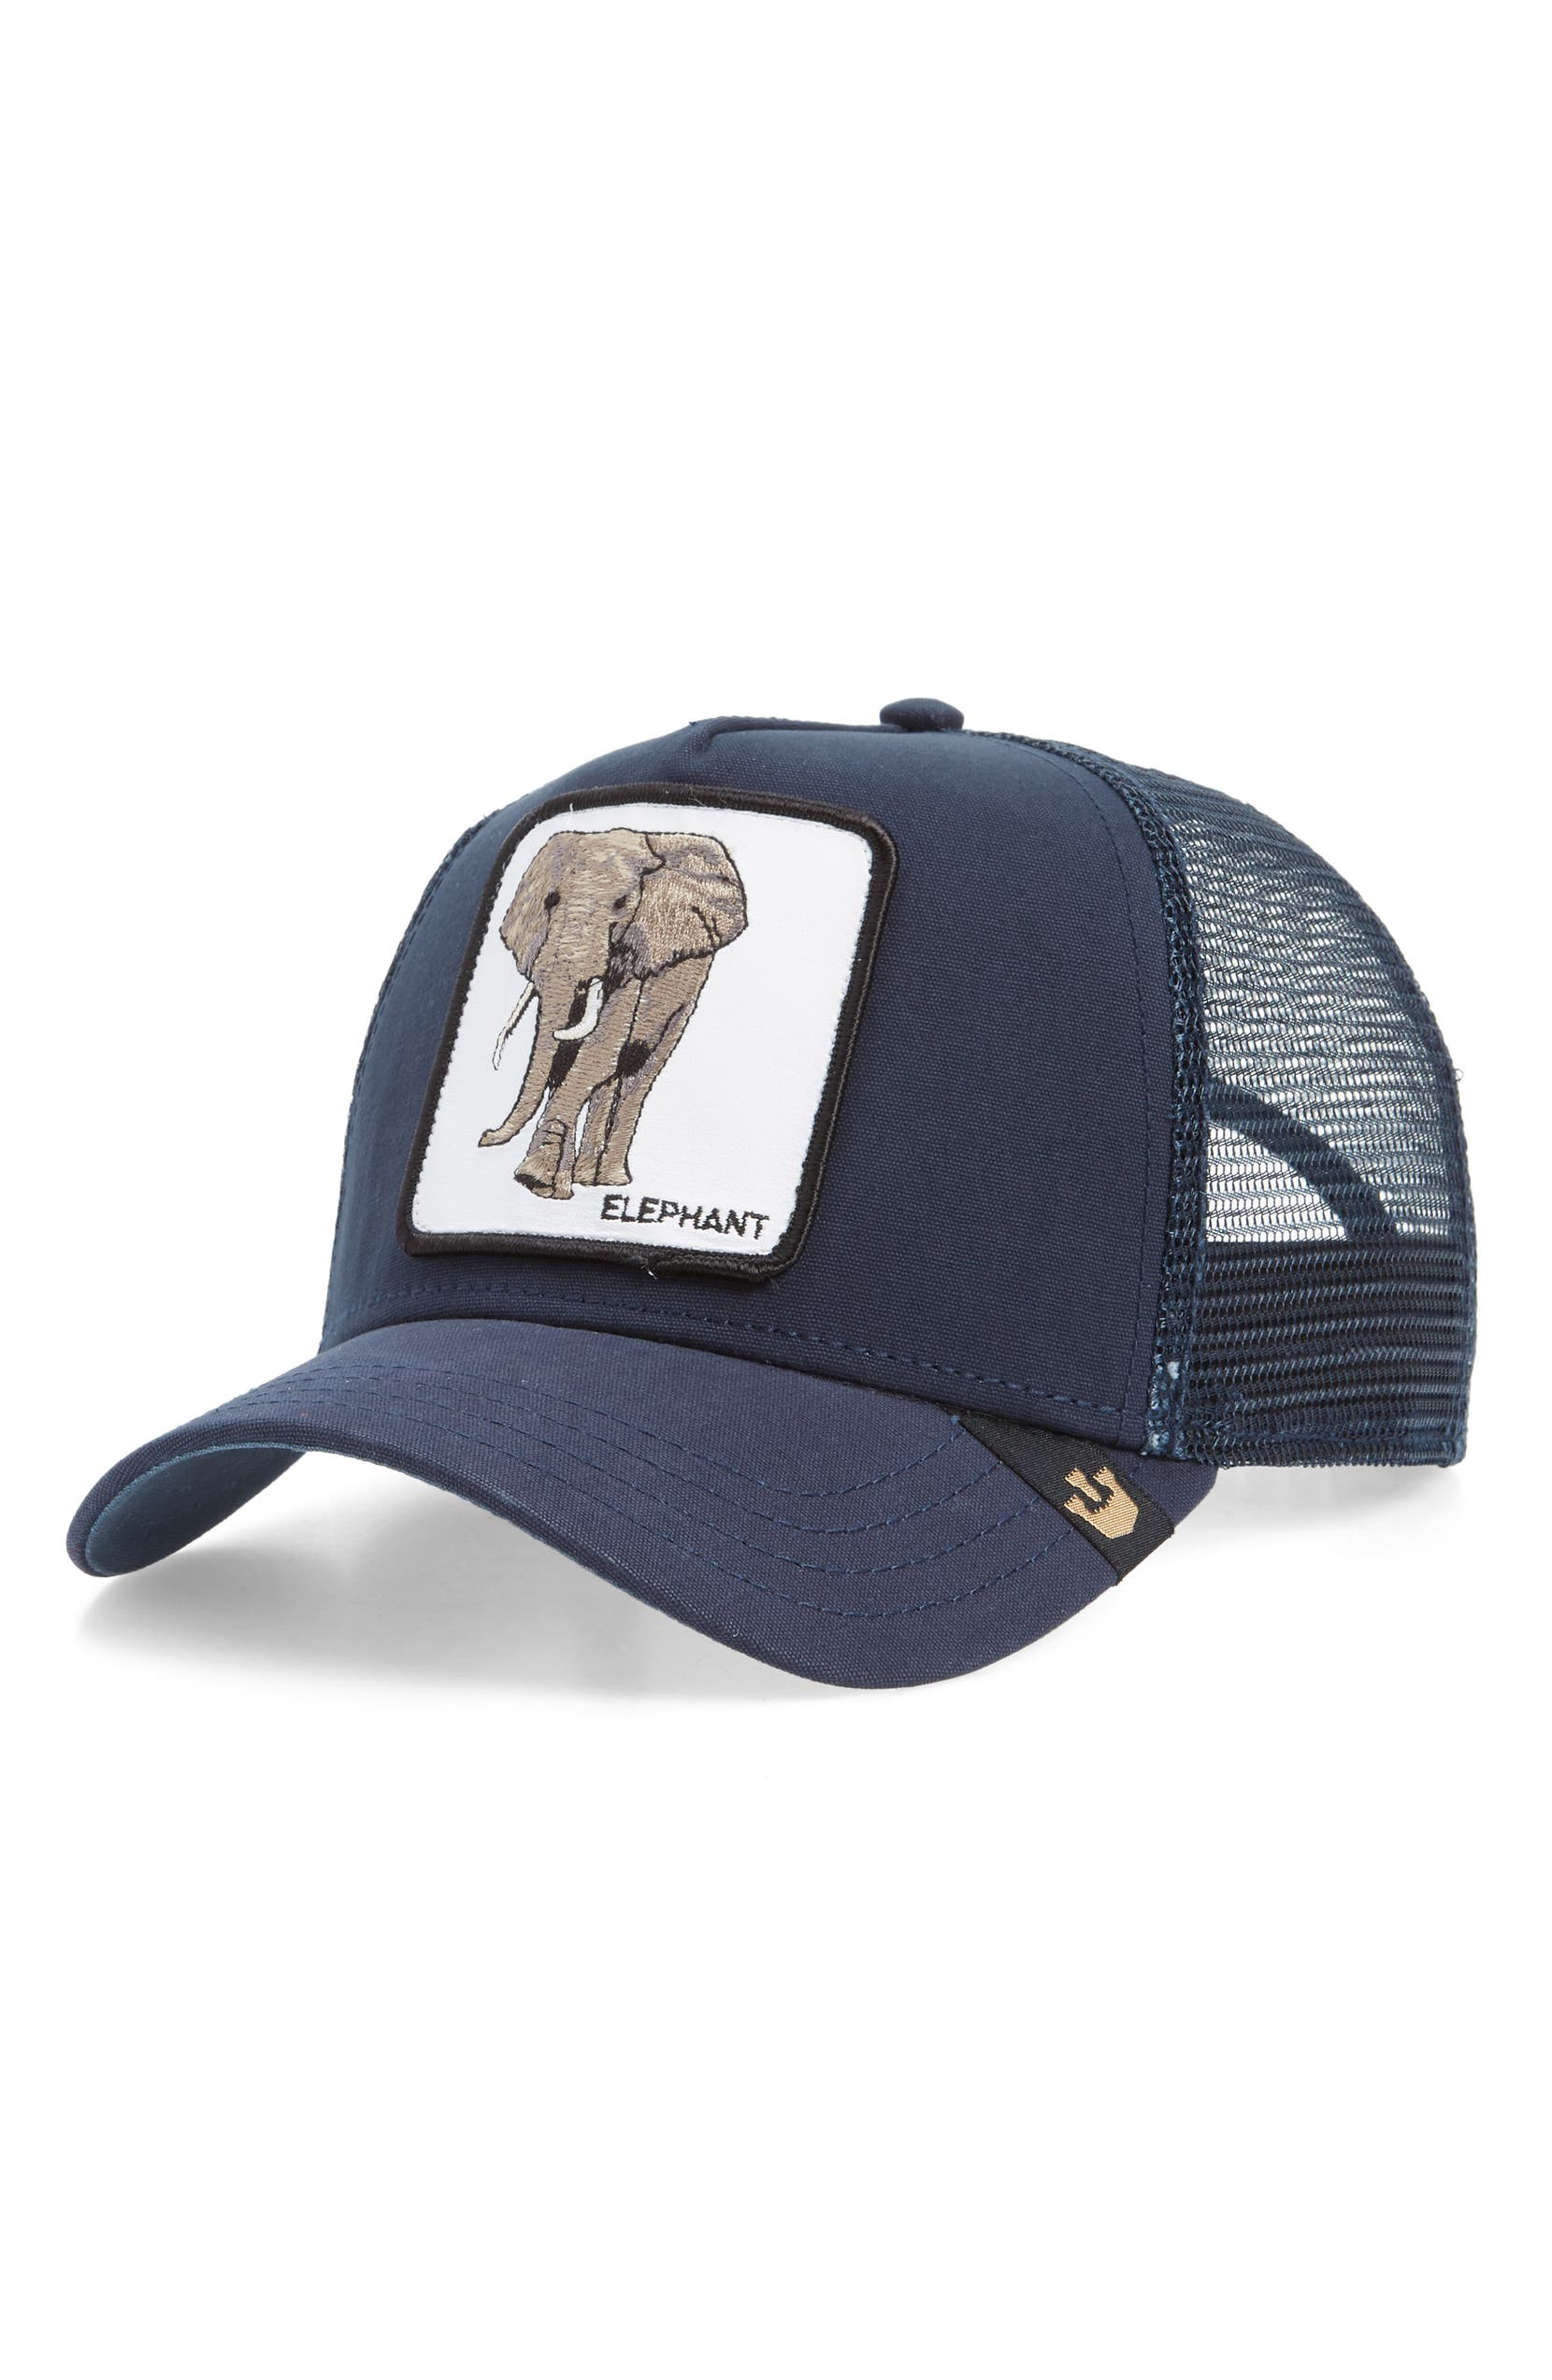 Goorin Brothers Elephant Trucker Hat  099f98a4aa8